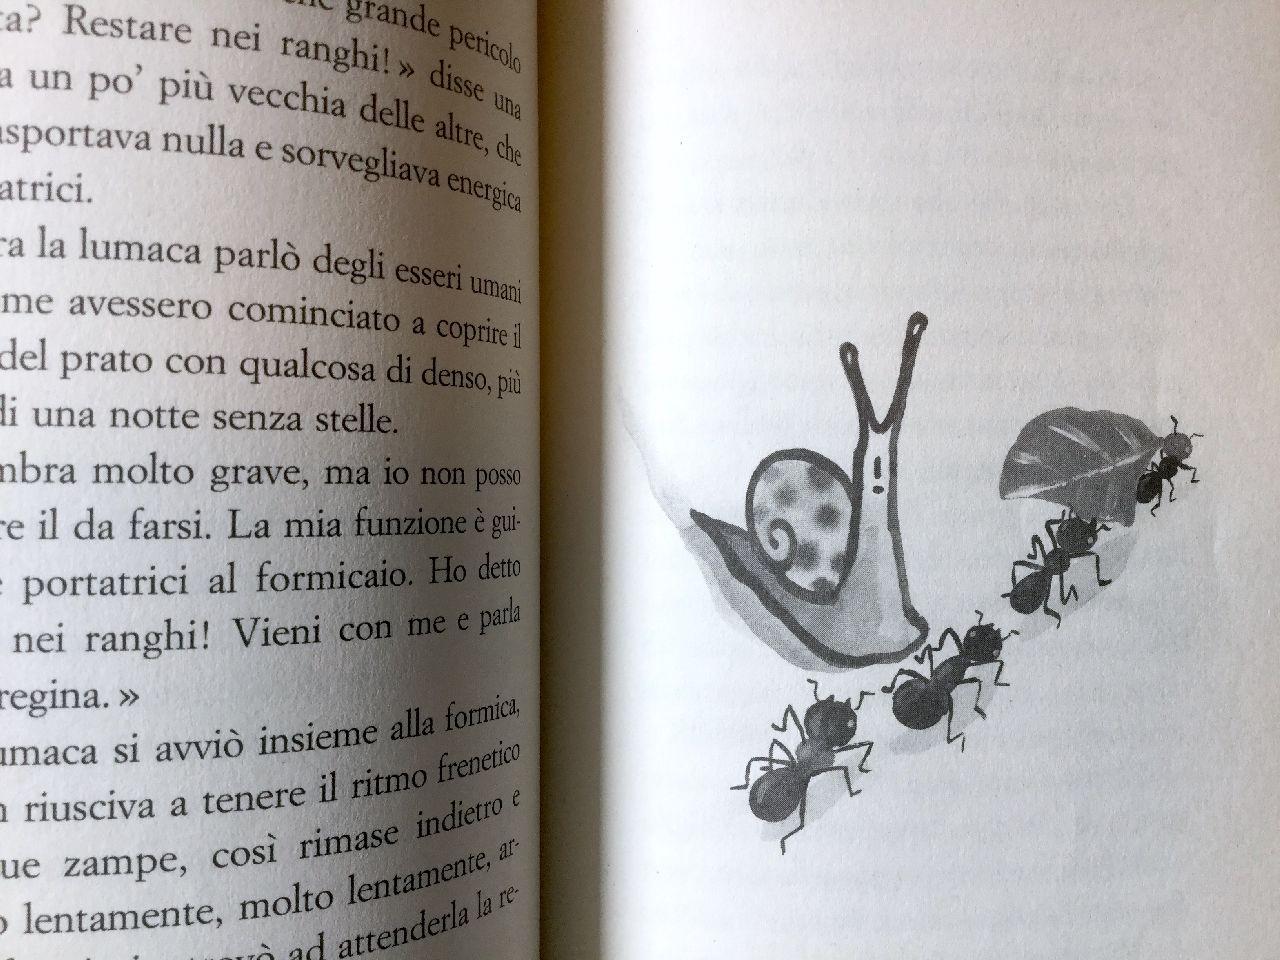 Luis Sepúlveda, Storia di un di una lumaca che scoprì l'importanza della lentezza, Guanda